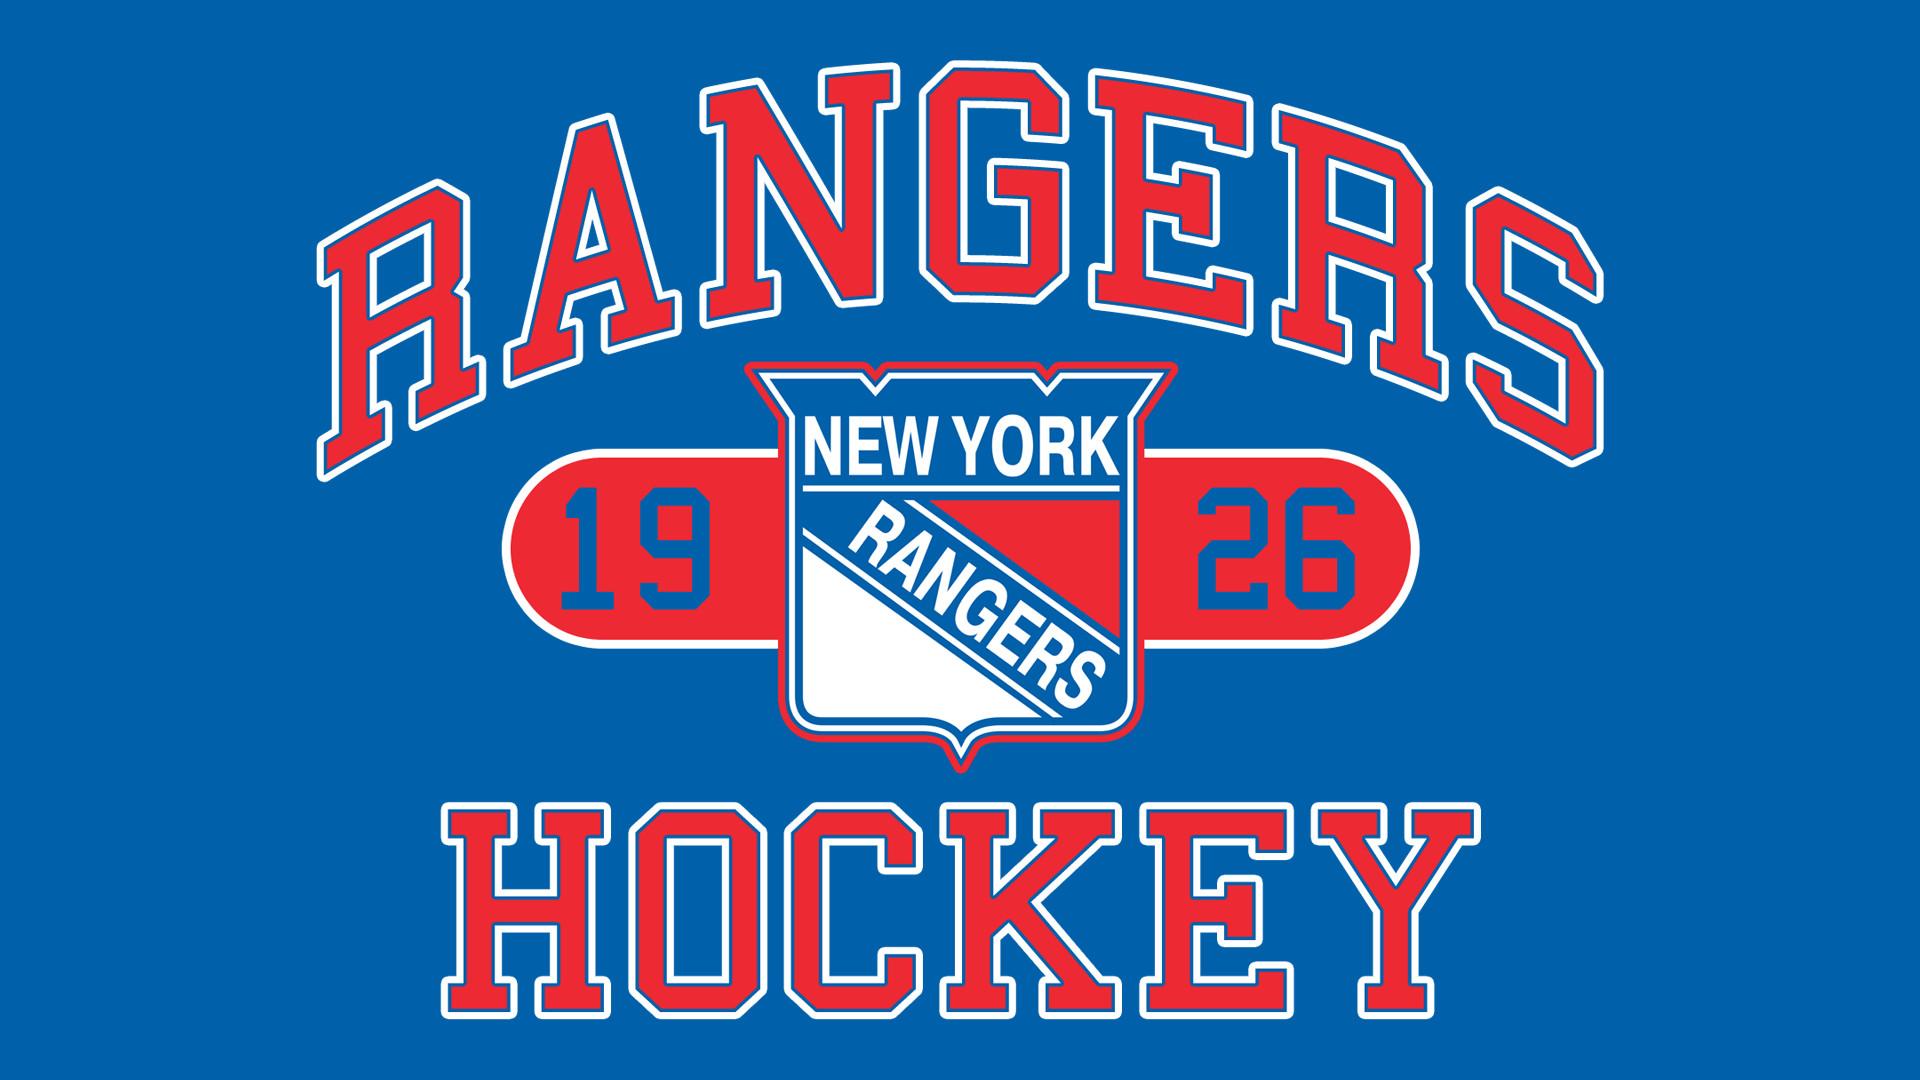 1920x1080 Rangers NHL | #3